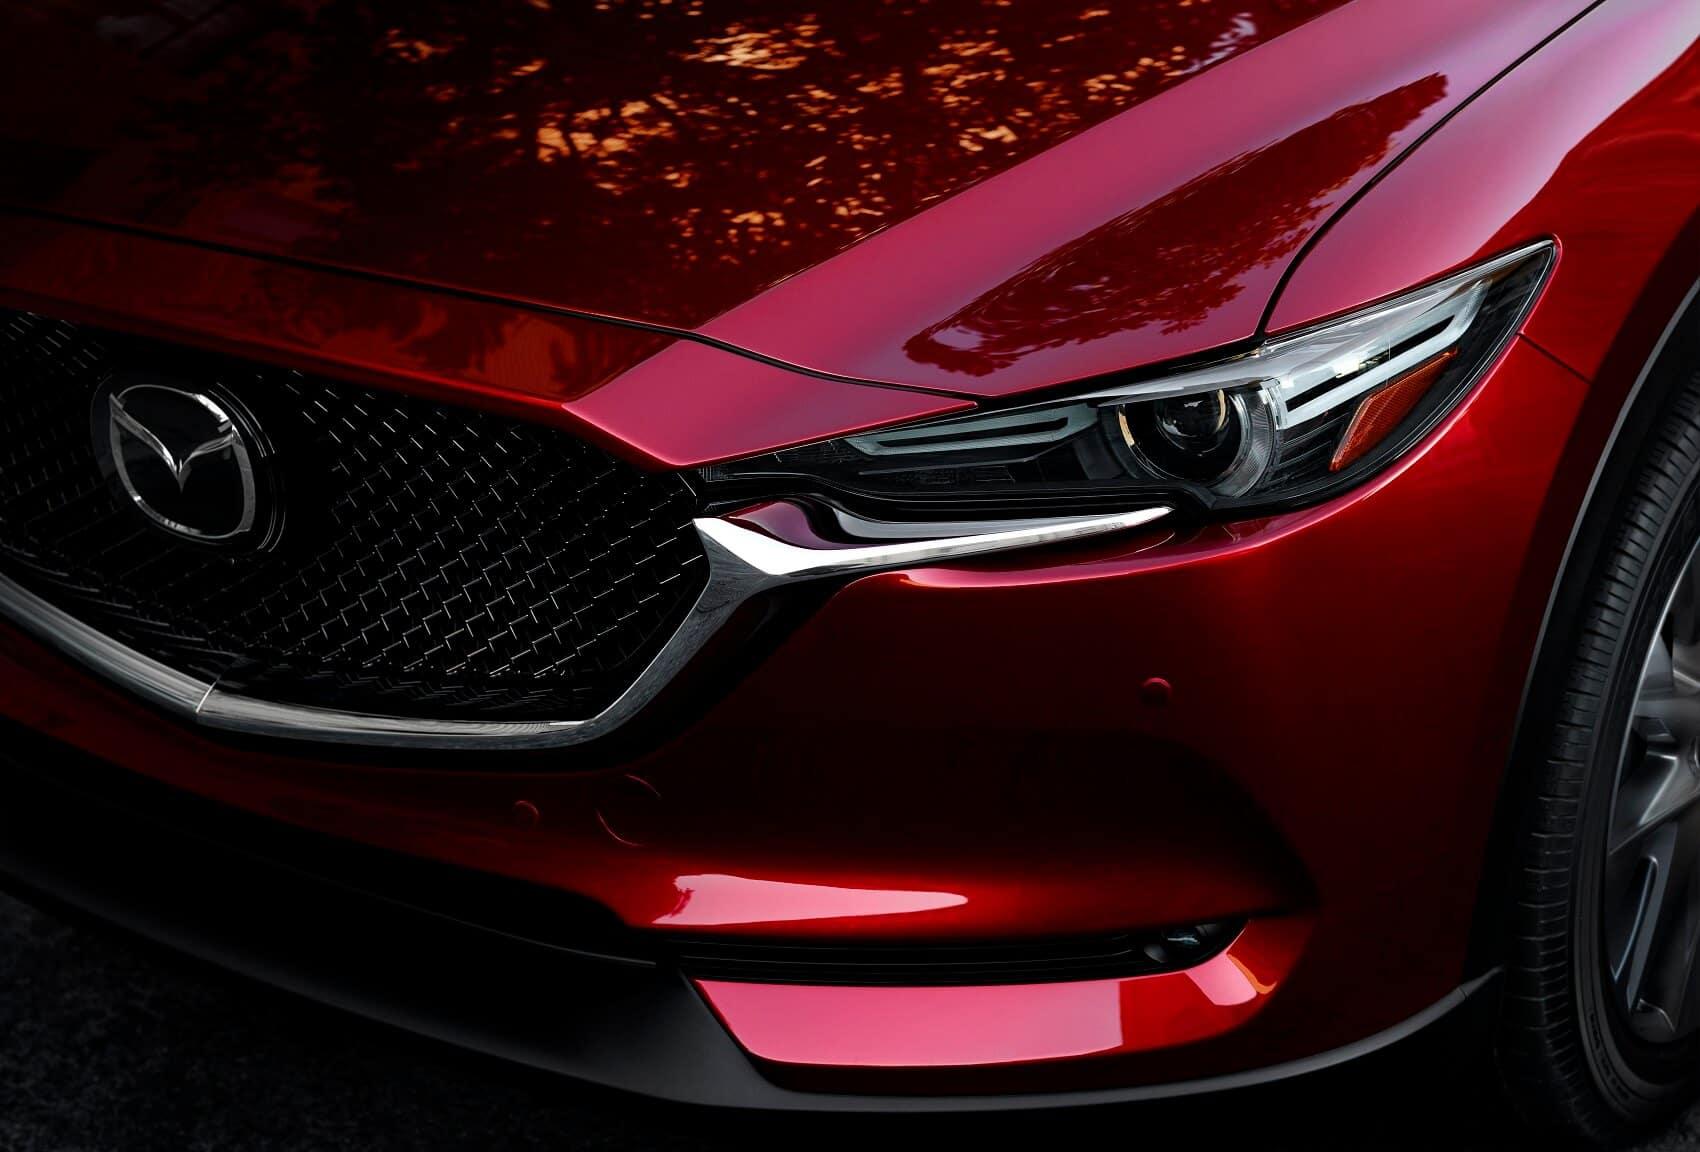 Mazda CX-5 Headlight